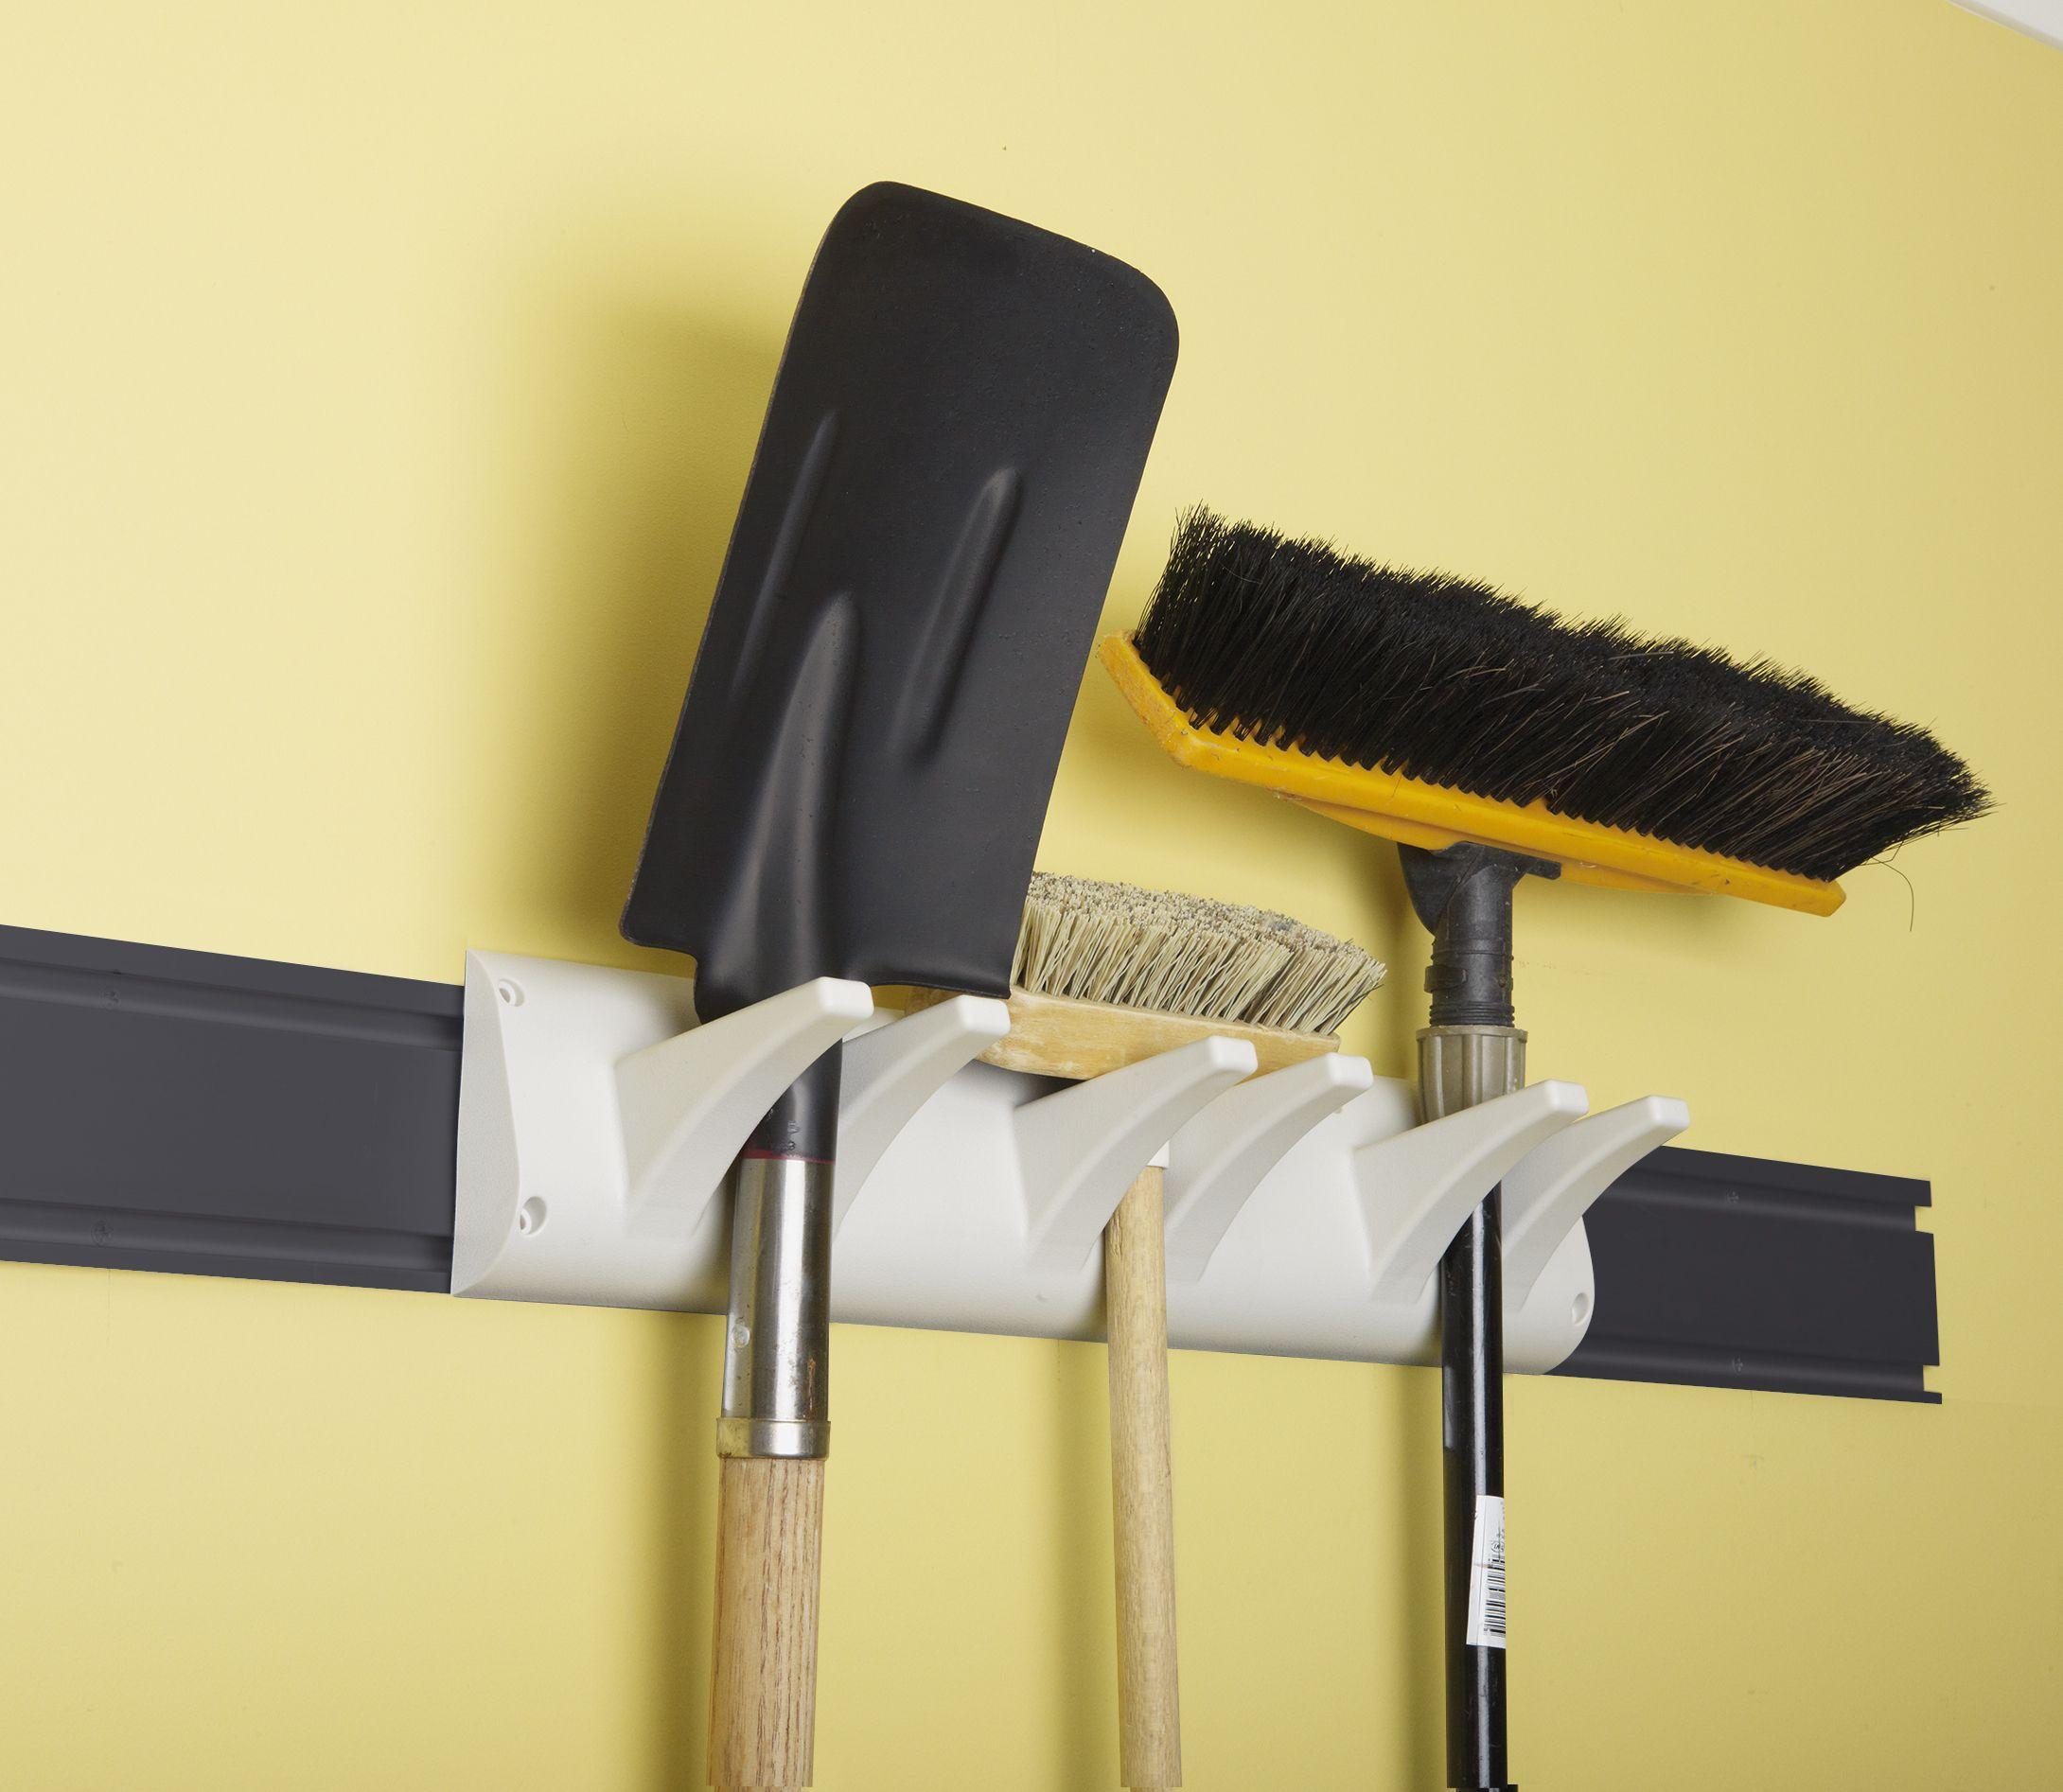 Storease Bracket Wall Access Dual Rail R00a Bunnings Warehouse Tool Hangers Broom Storage Hanger